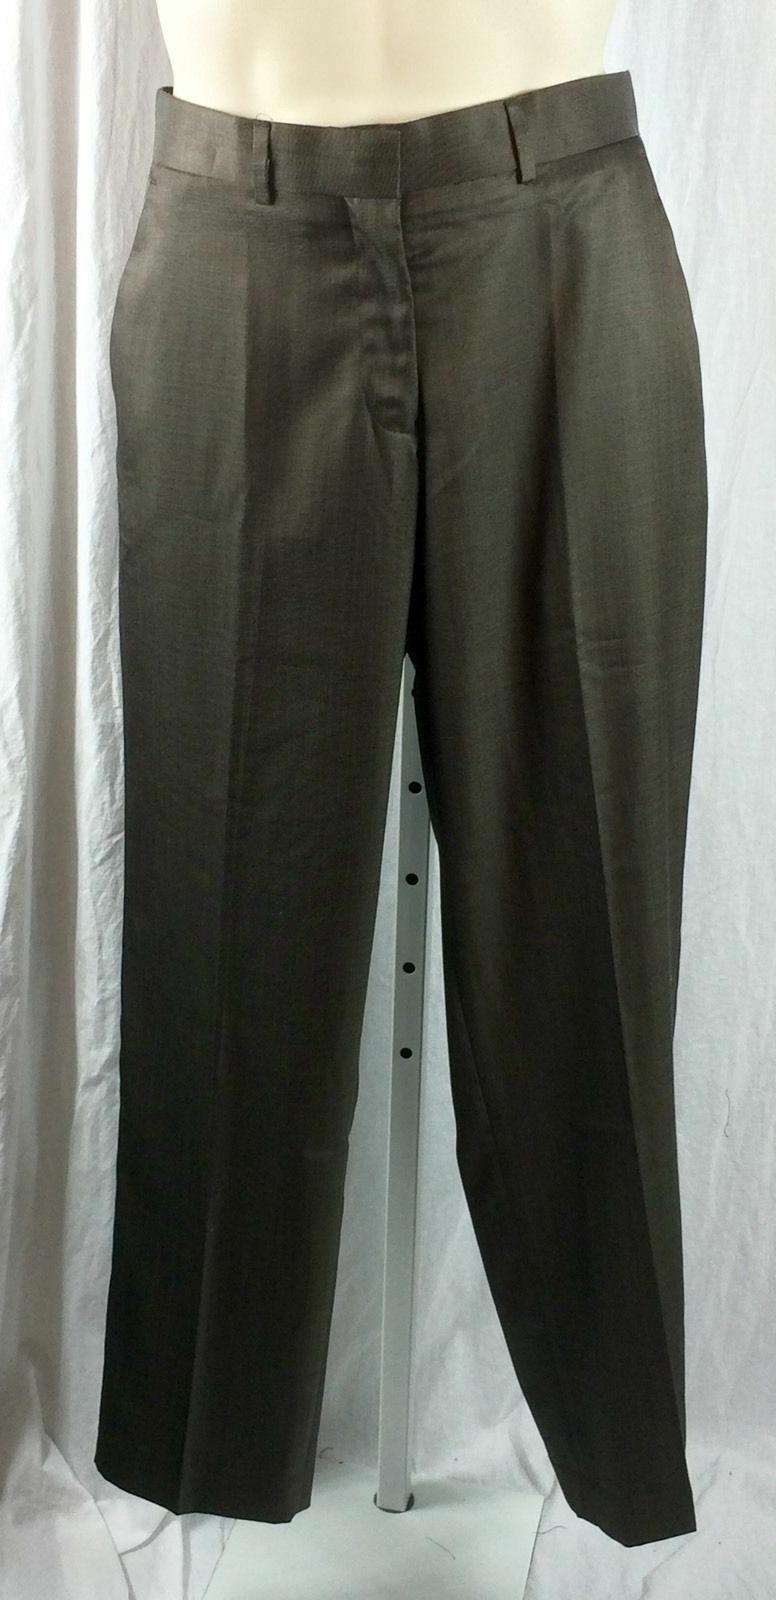 Mens Dockers Suit Pants Size Brown Blend NWT